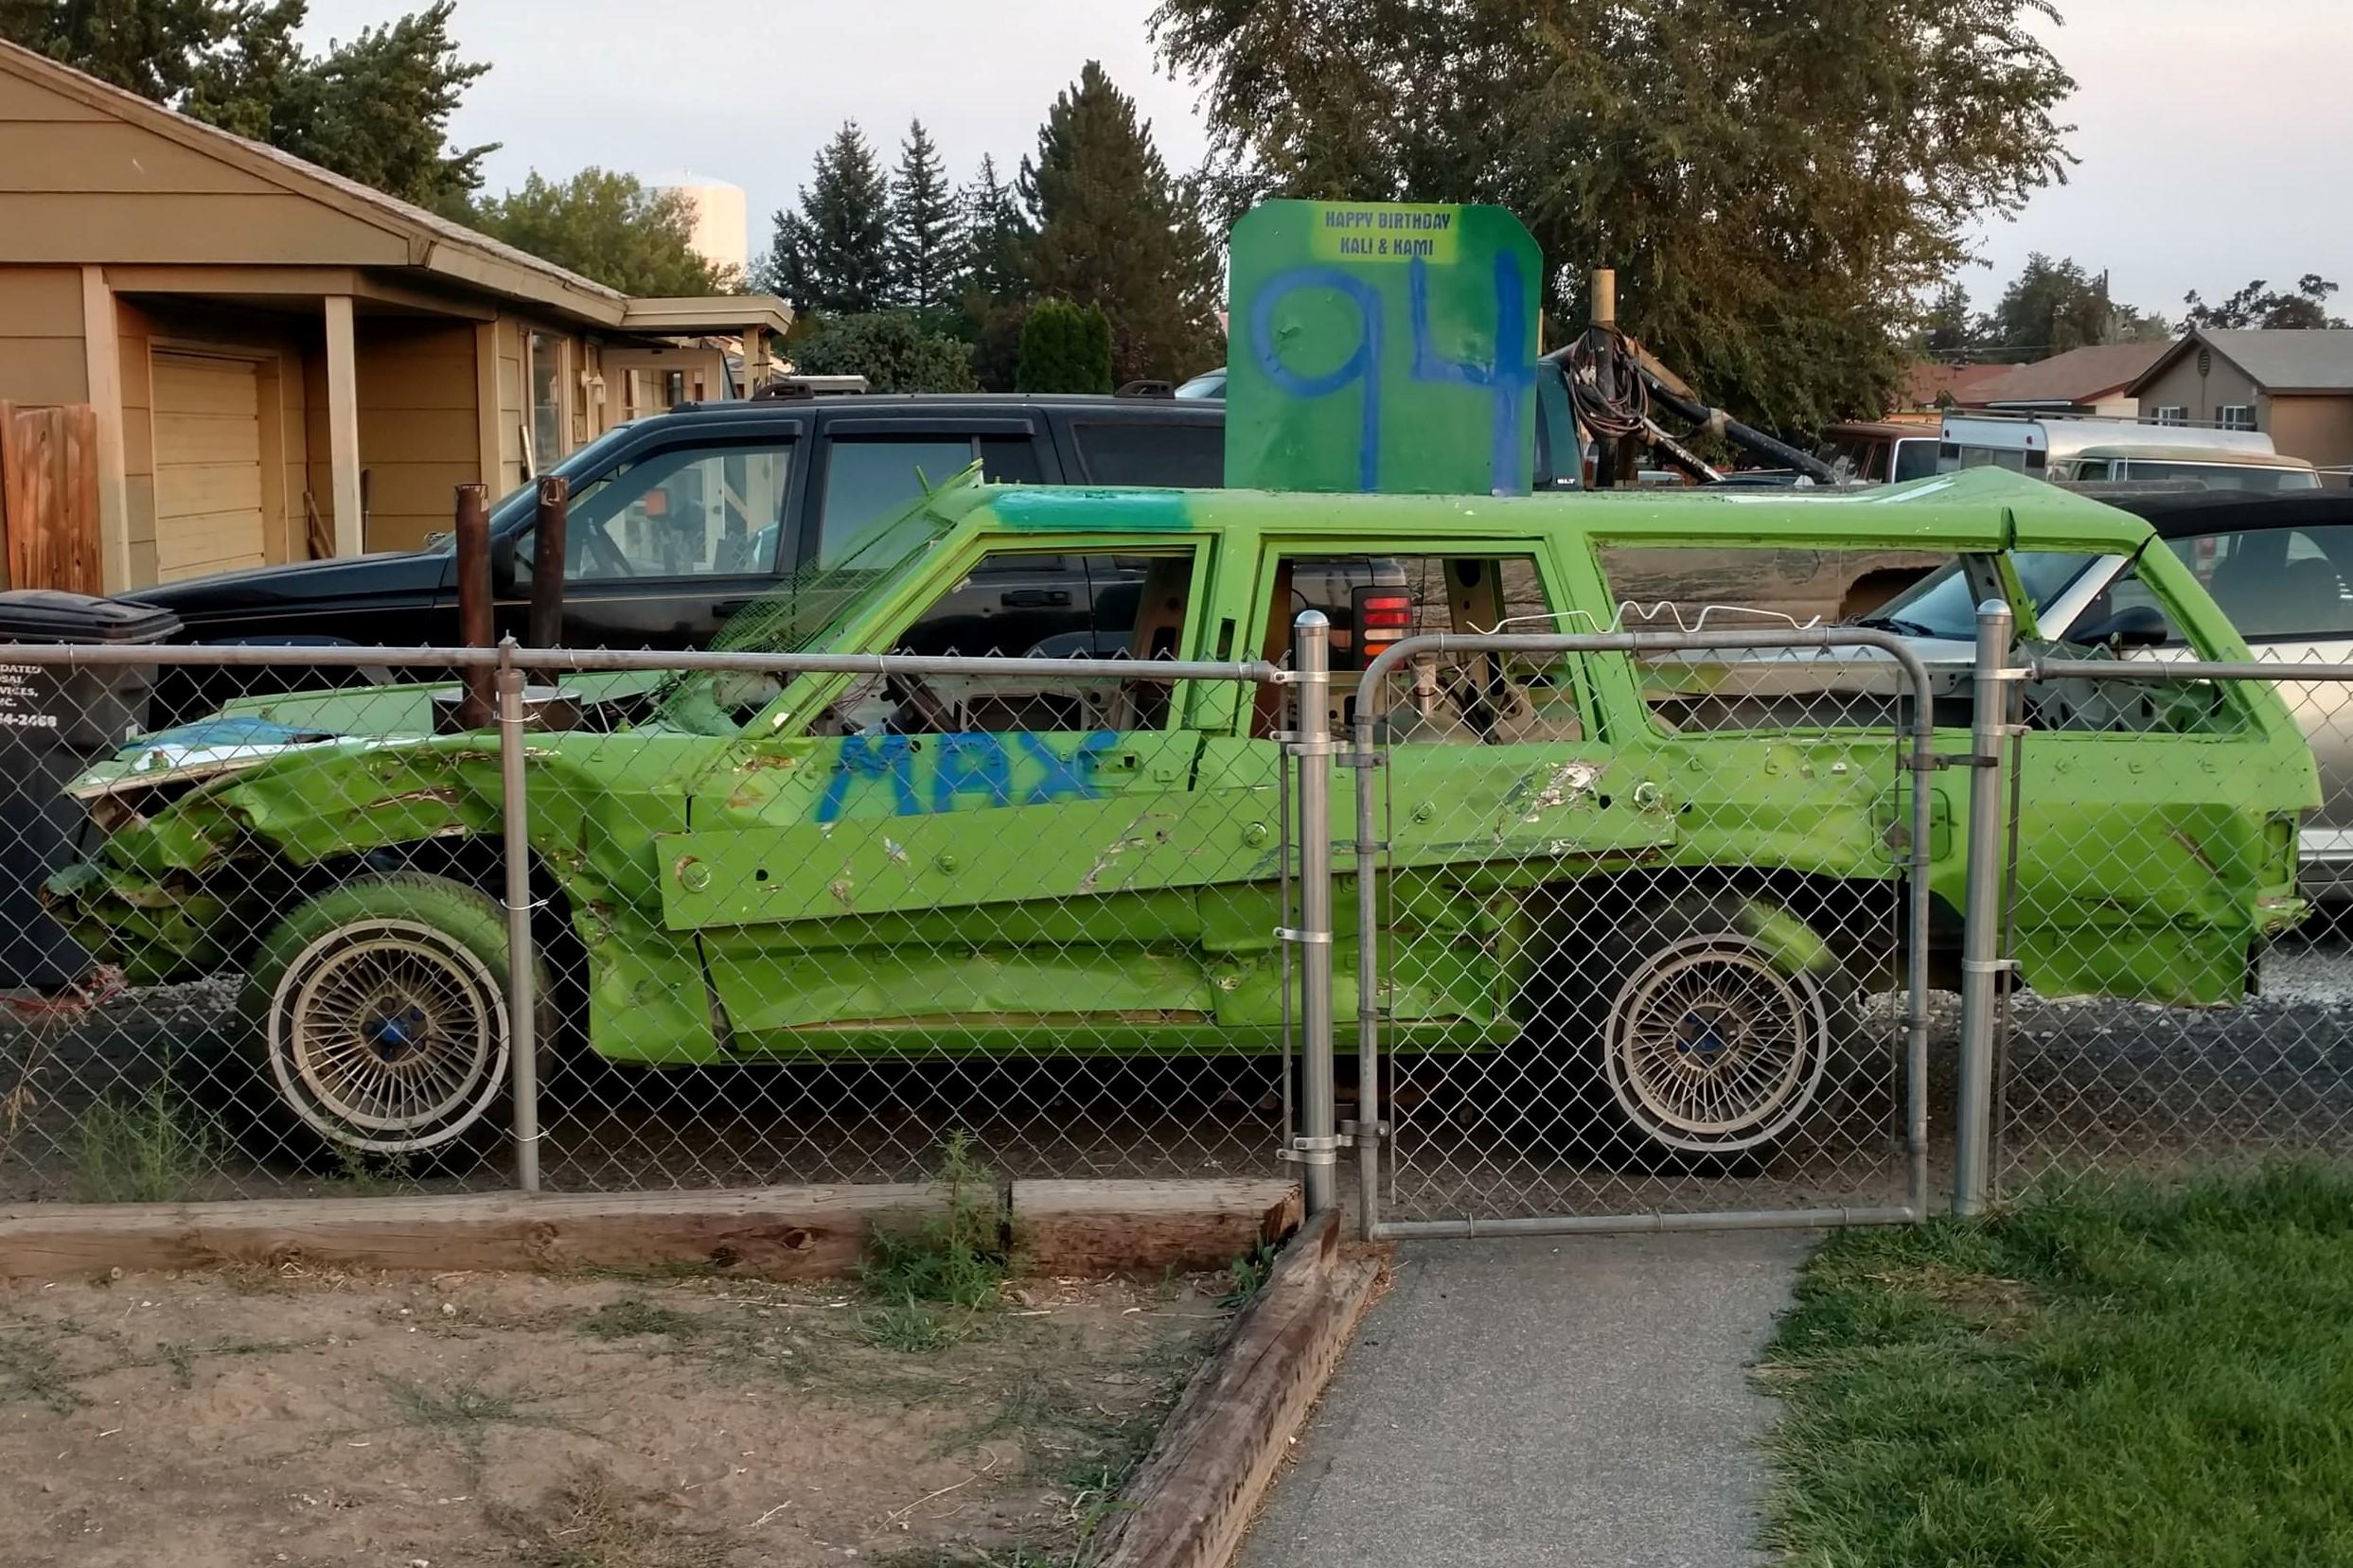 #94 Jason Randall - Hometown: Moses Lake, WAAge: 43Experience: 24 yearsPast Wins: 2Sponsors: Scotty's Auto Repair